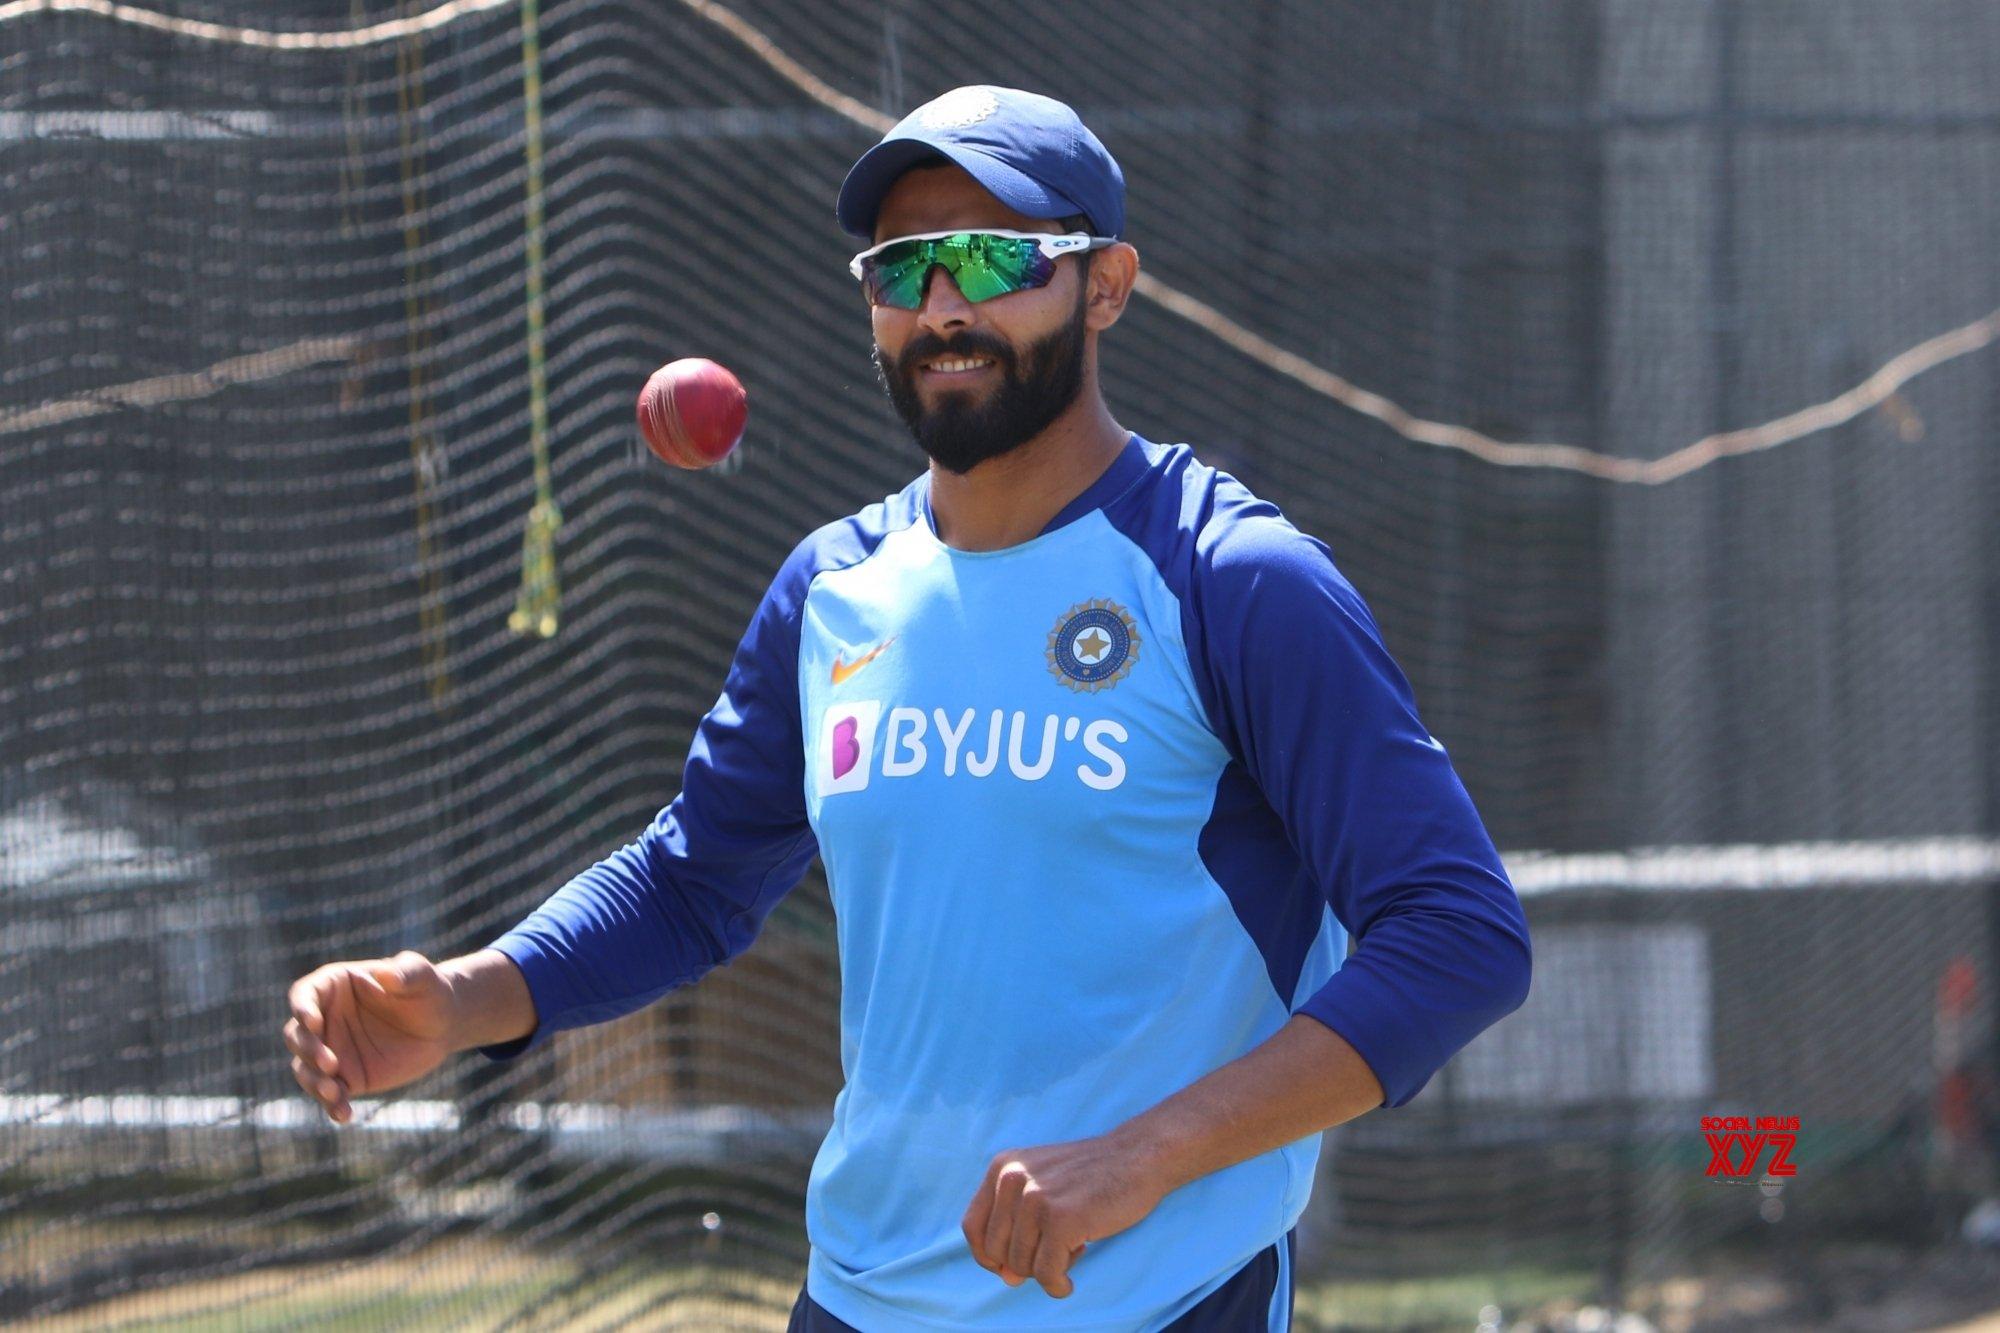 Ravindra Jadeja named India's 21st century MVP by Wisden